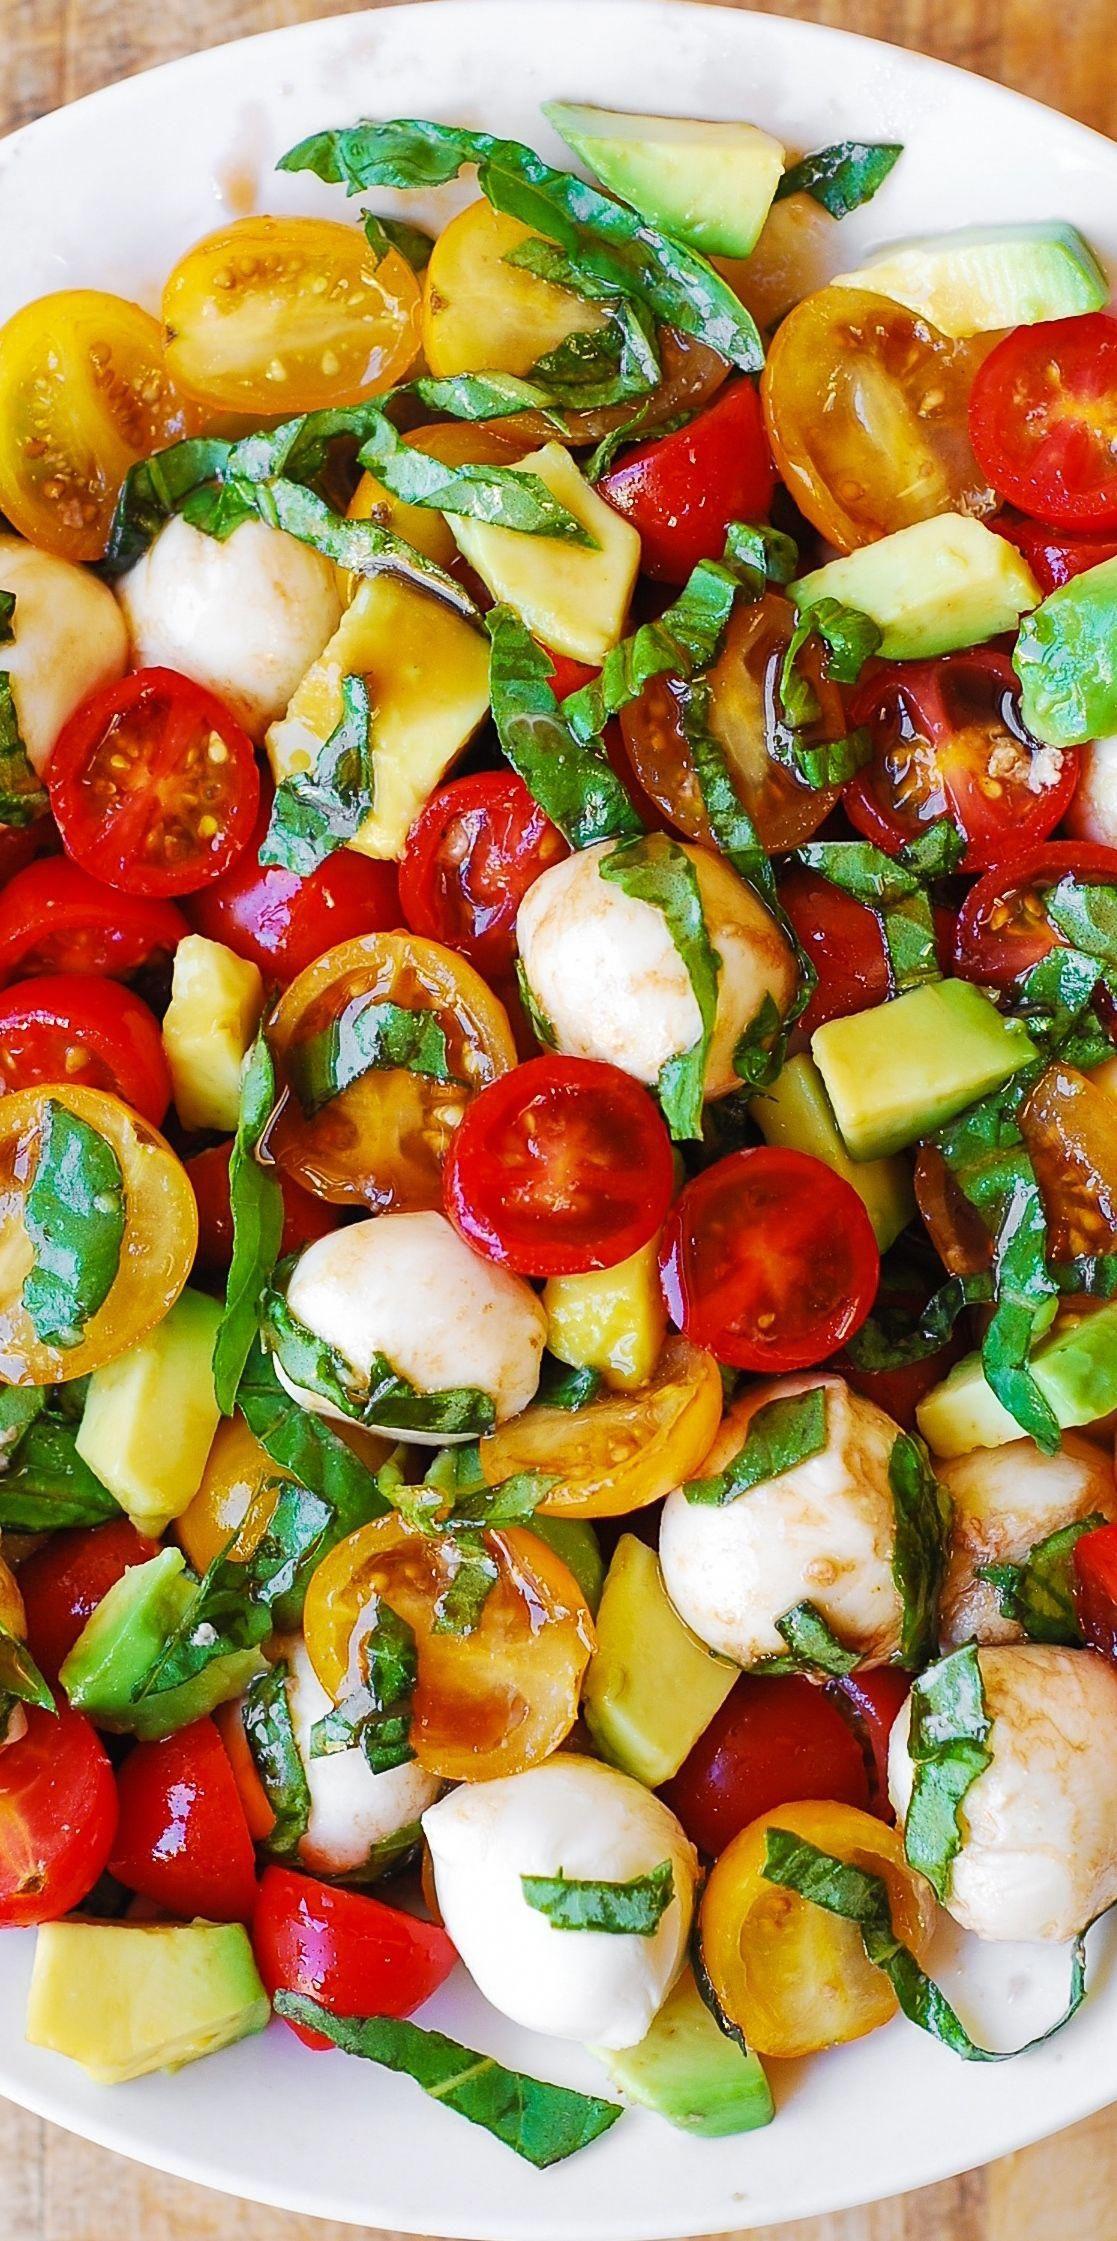 Tomato Basil Avocado Mozzarella Salad With Balsamic